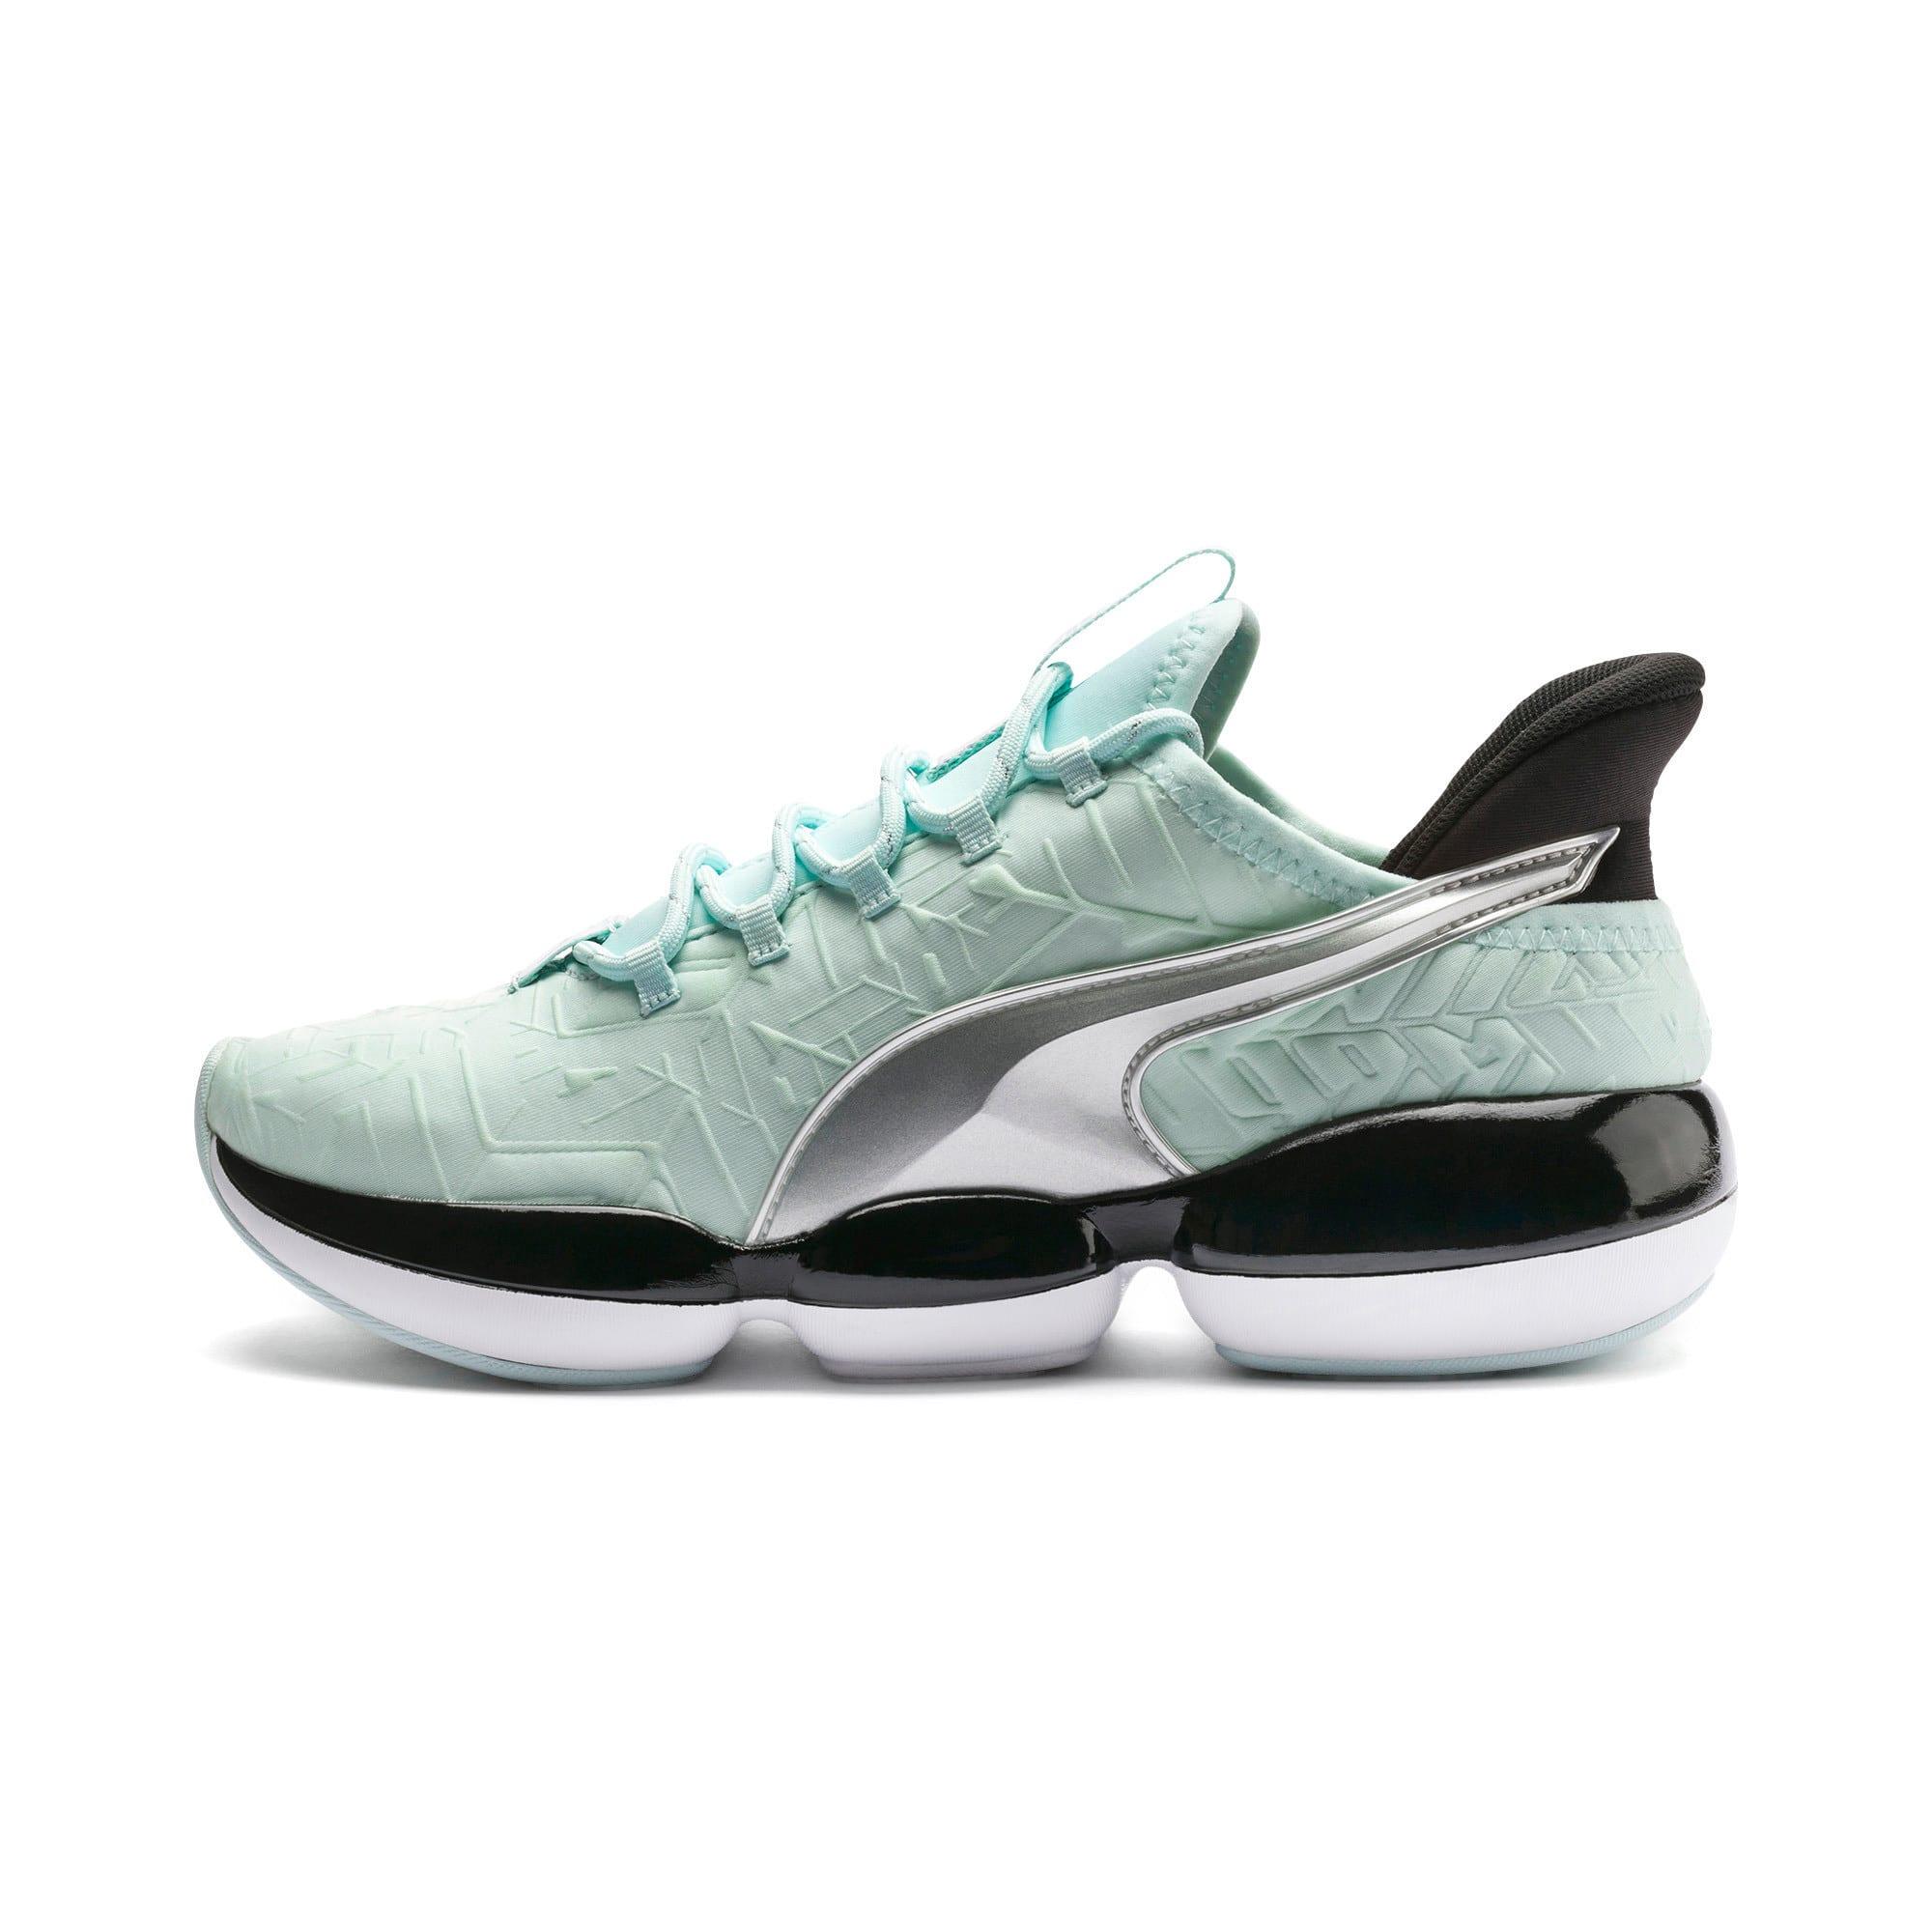 Thumbnail 1 of Mode XT Trailblazer Women's Training Shoes, Fair Aqua-Puma White, medium